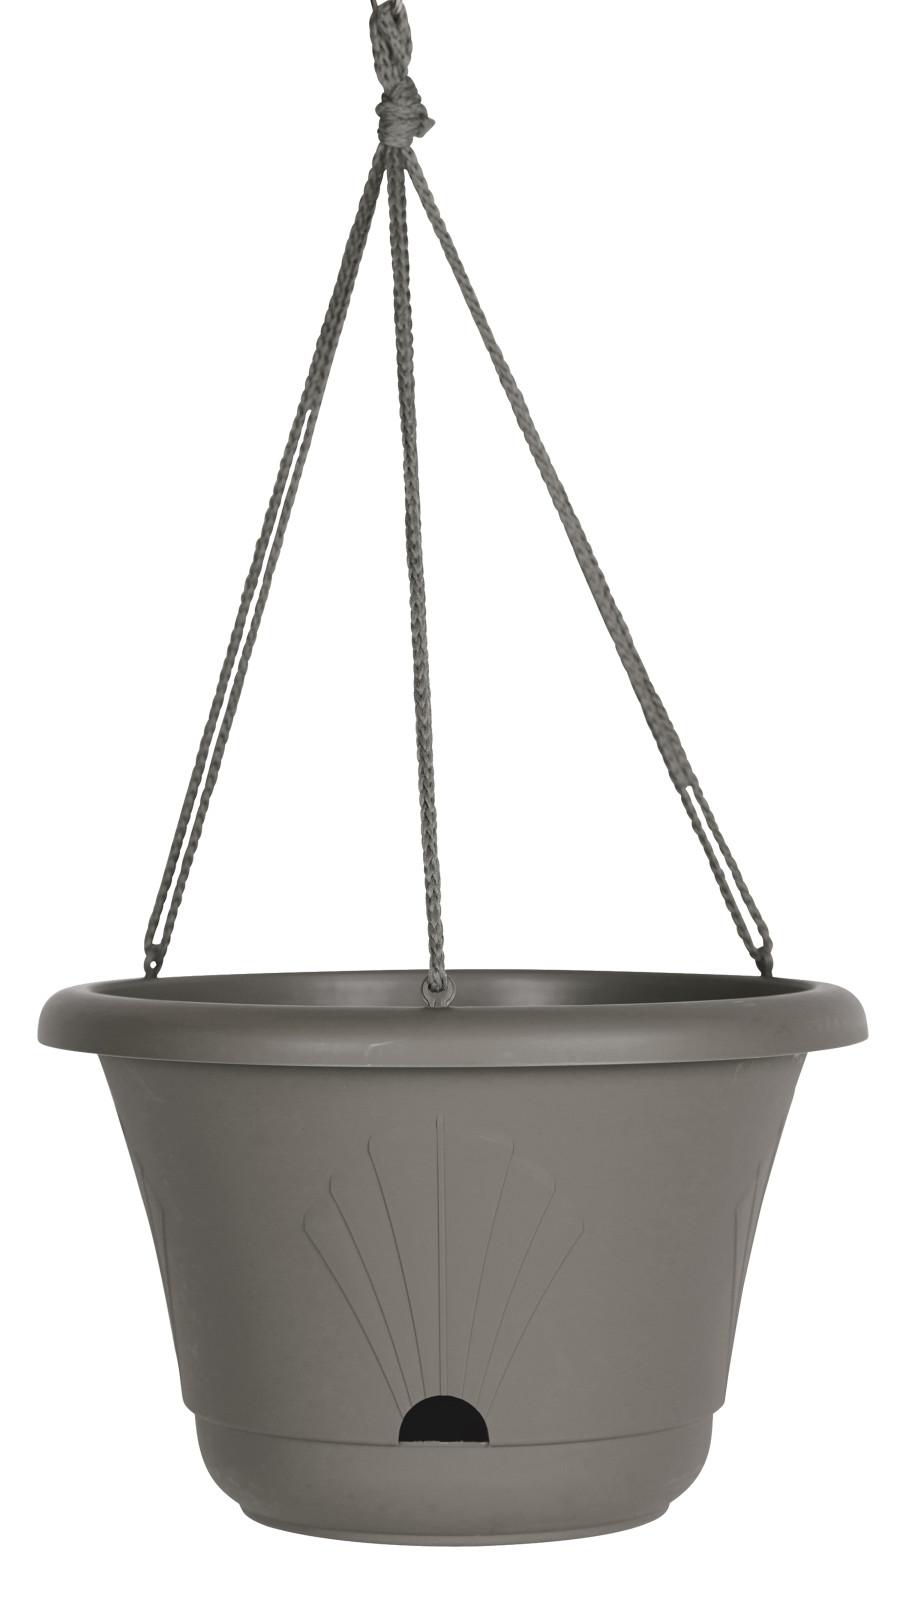 Bloem Lucca Hanging Basket Planter Charcoal 10ea/13 in